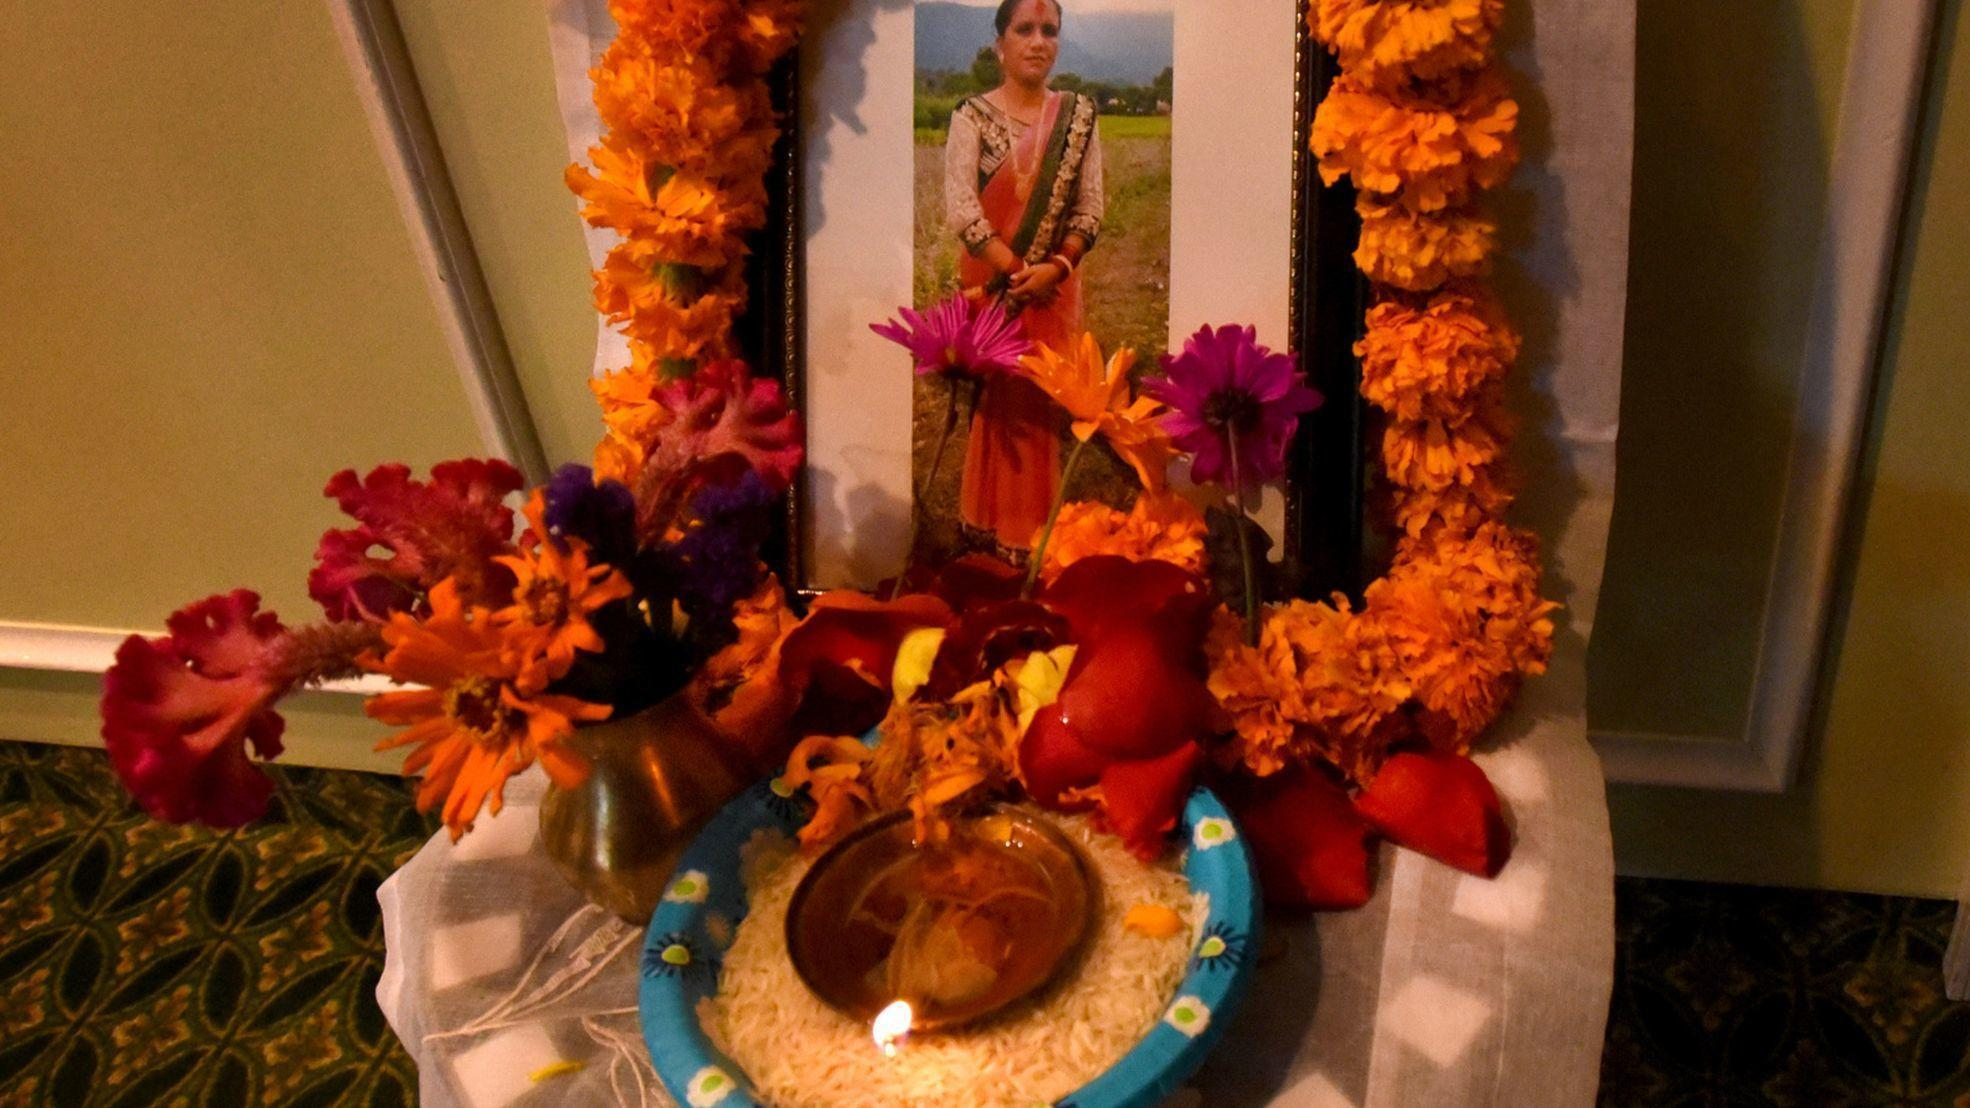 Marylands Nepali Community Mourns Brindra Giri A Recent Immigrant